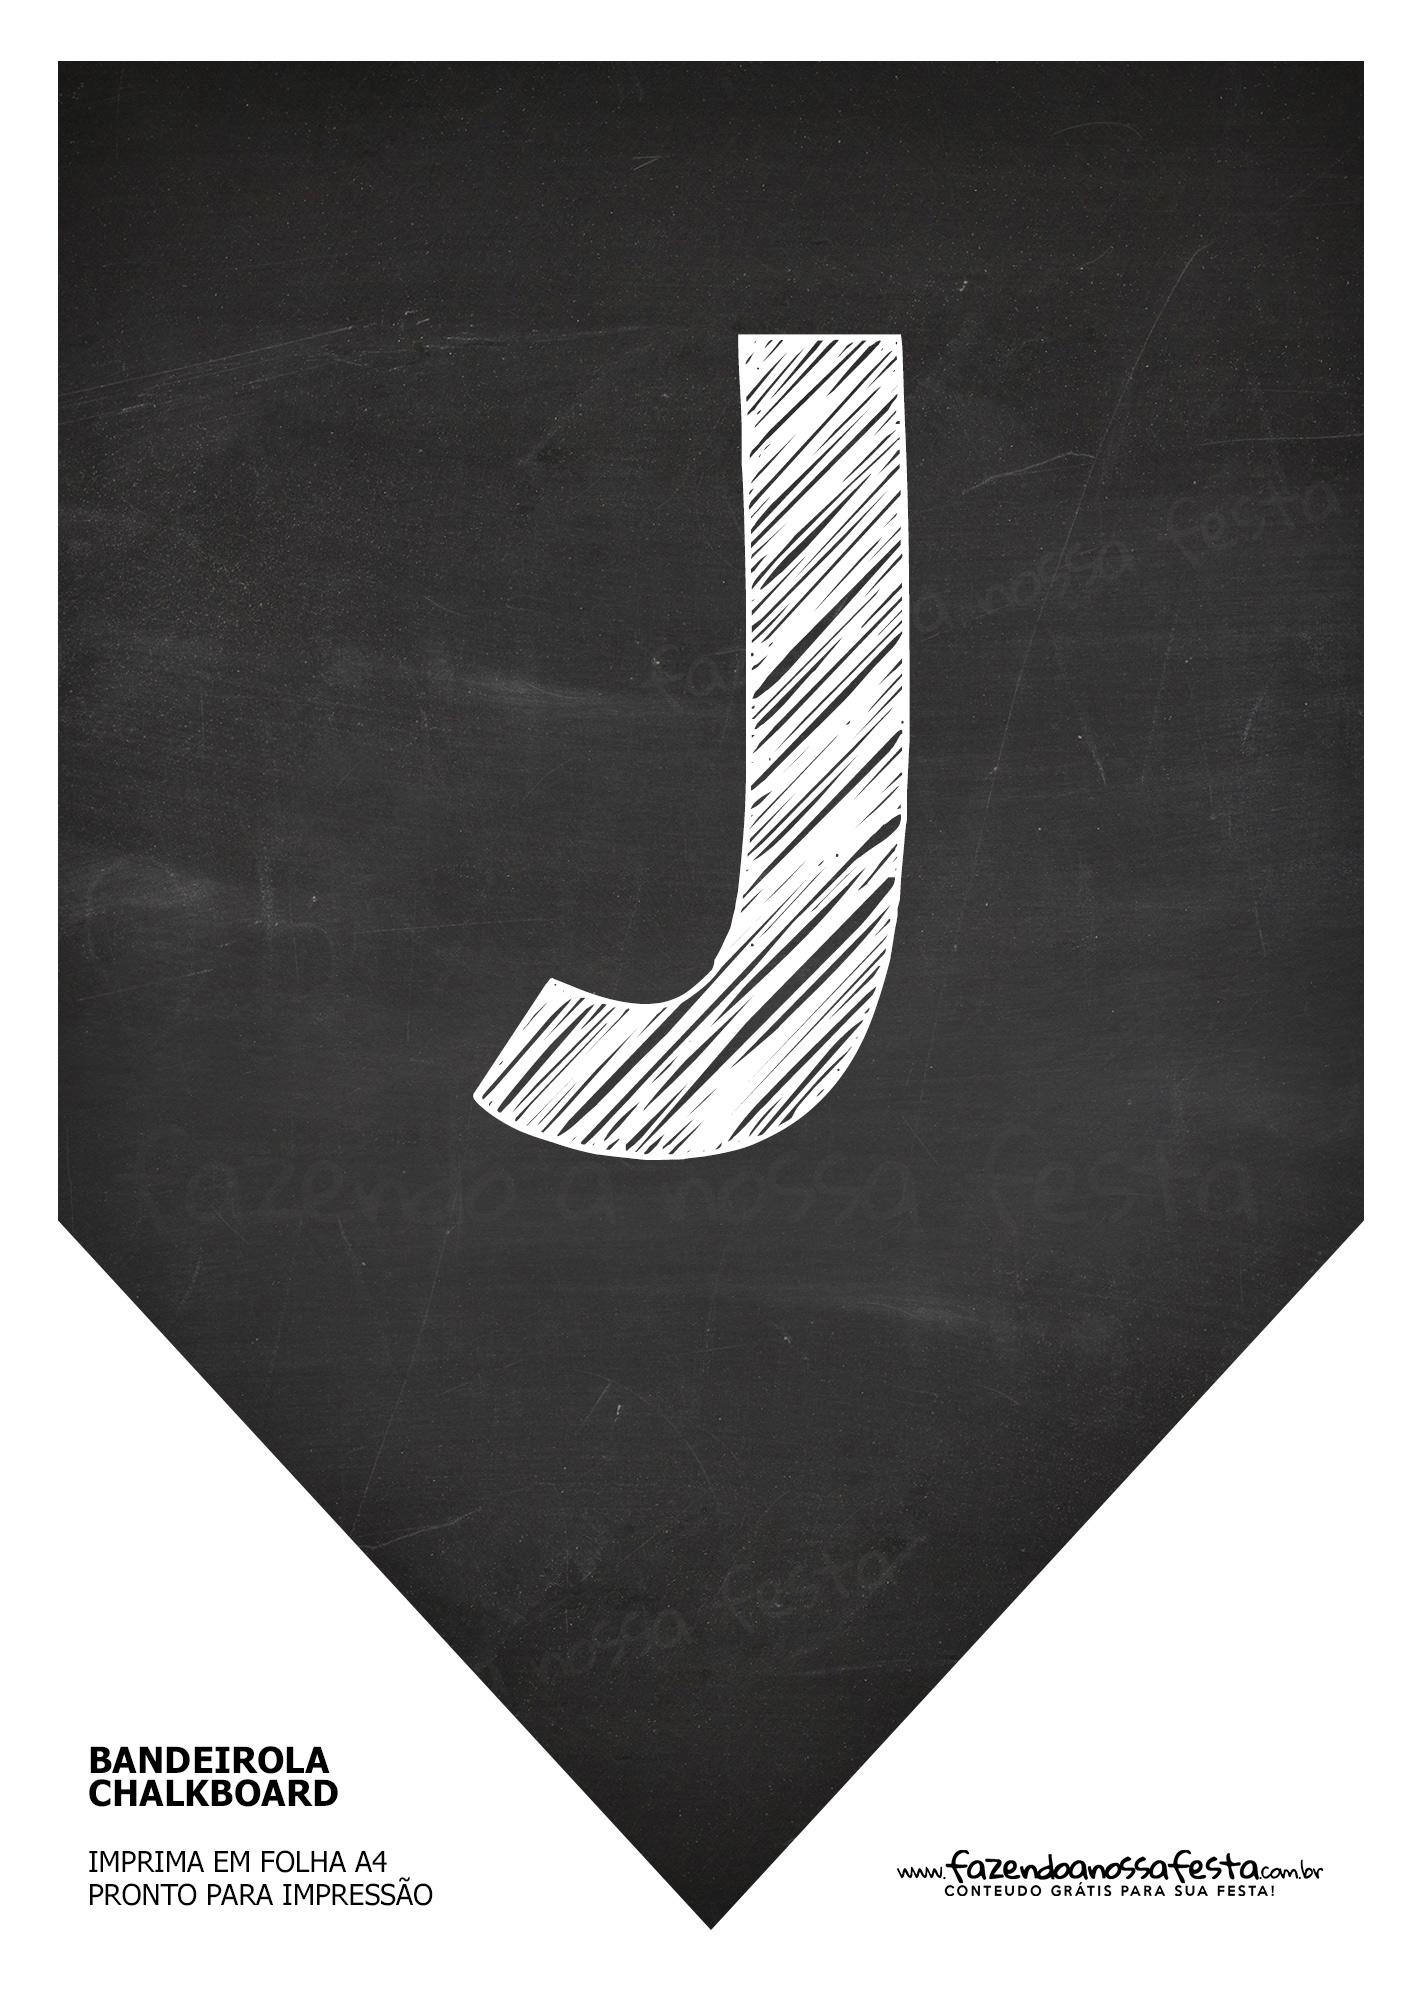 Bandeirinha Chalkboard J